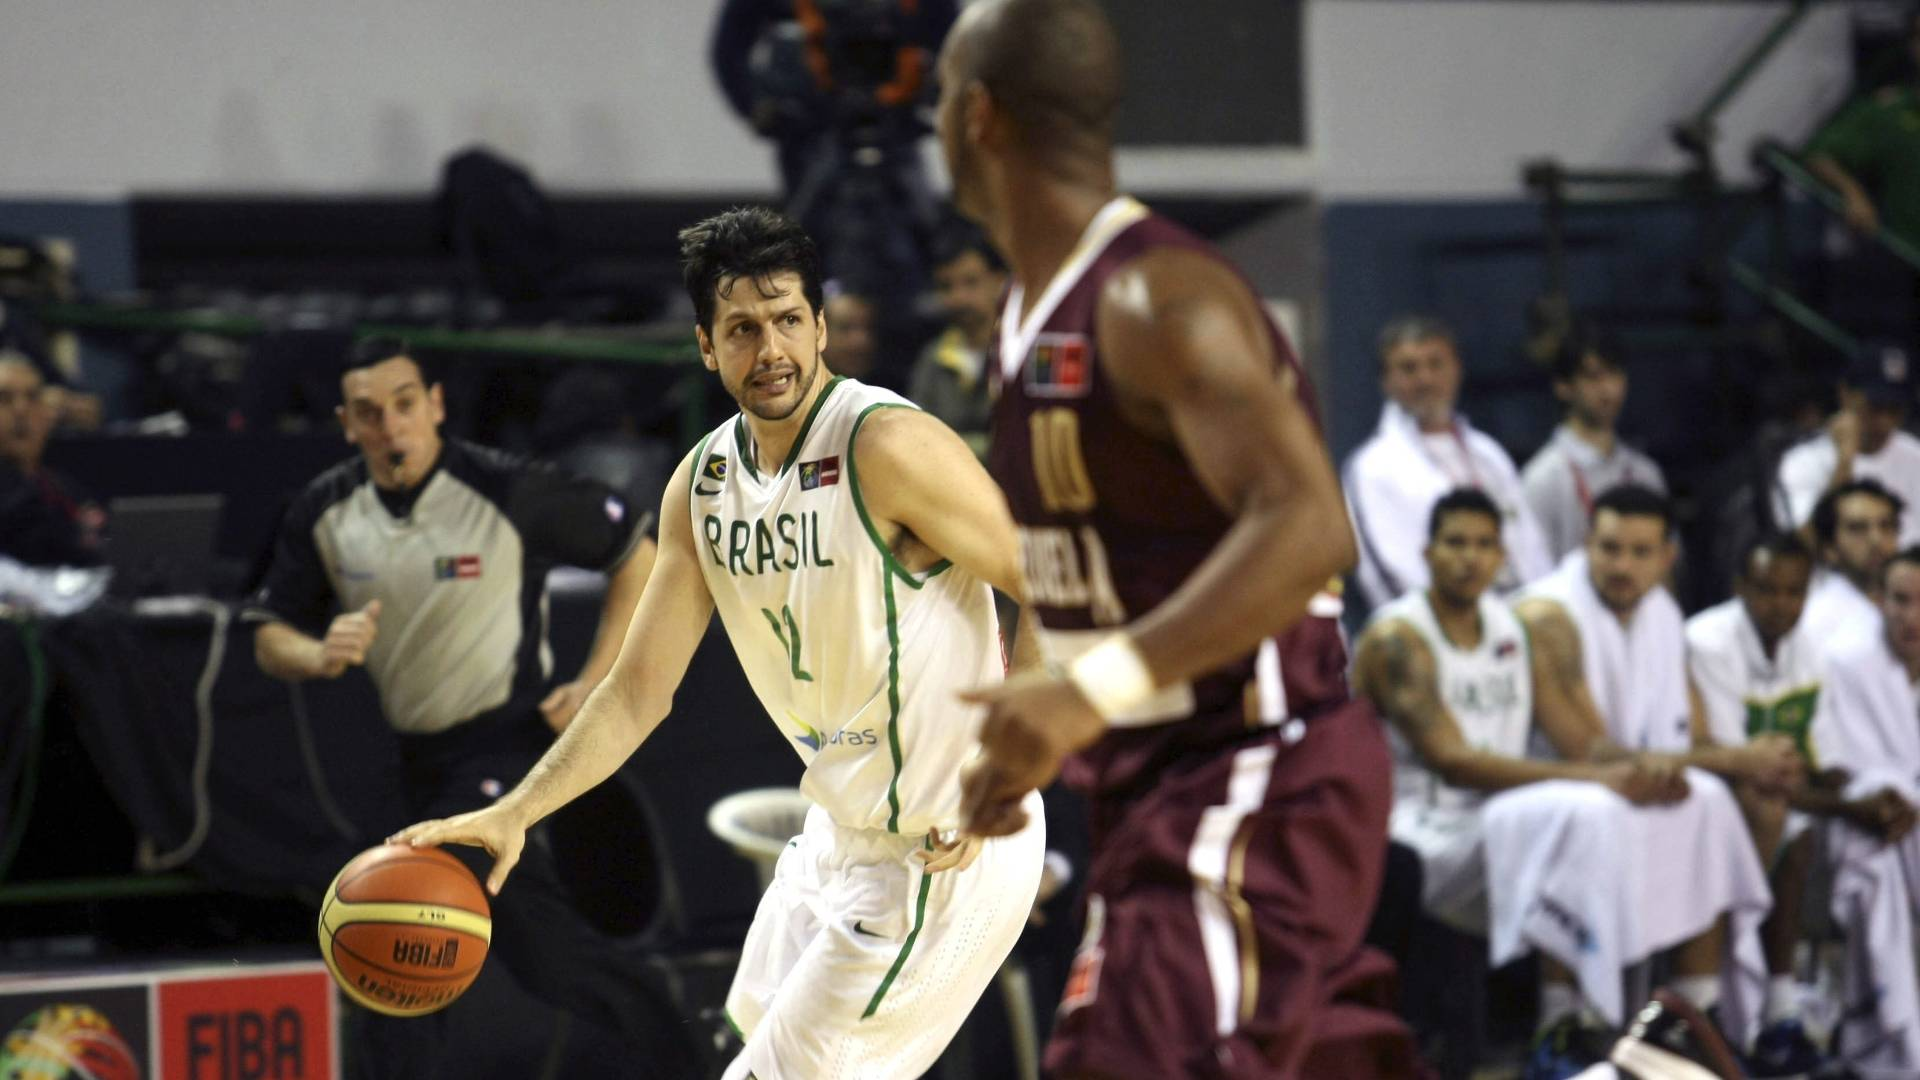 Ala-pivô Guilherme Giovannoni em ação no jogo Brasil x Venezuela